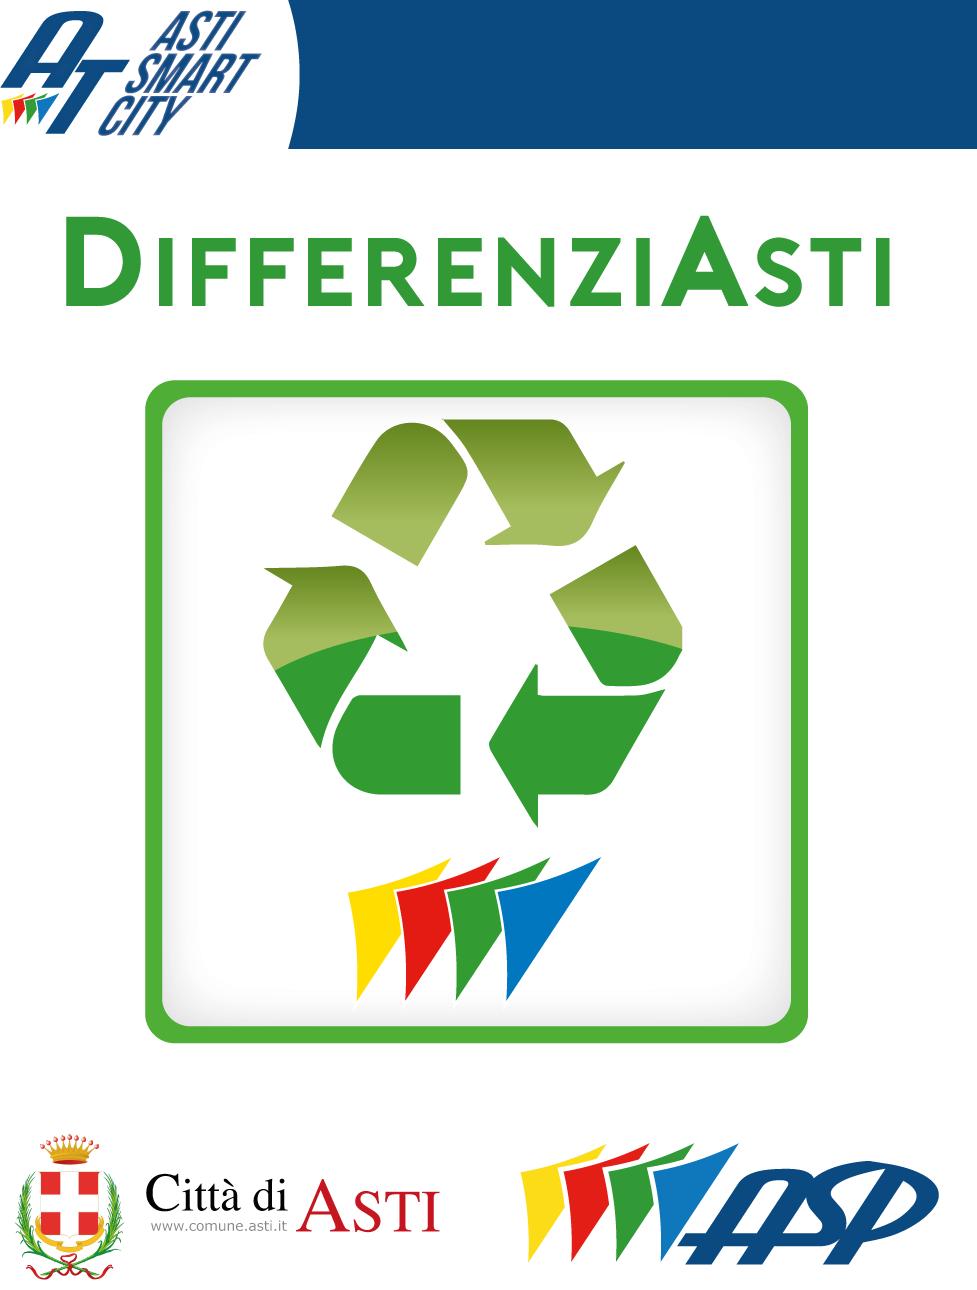 Logo DifferenziAsti